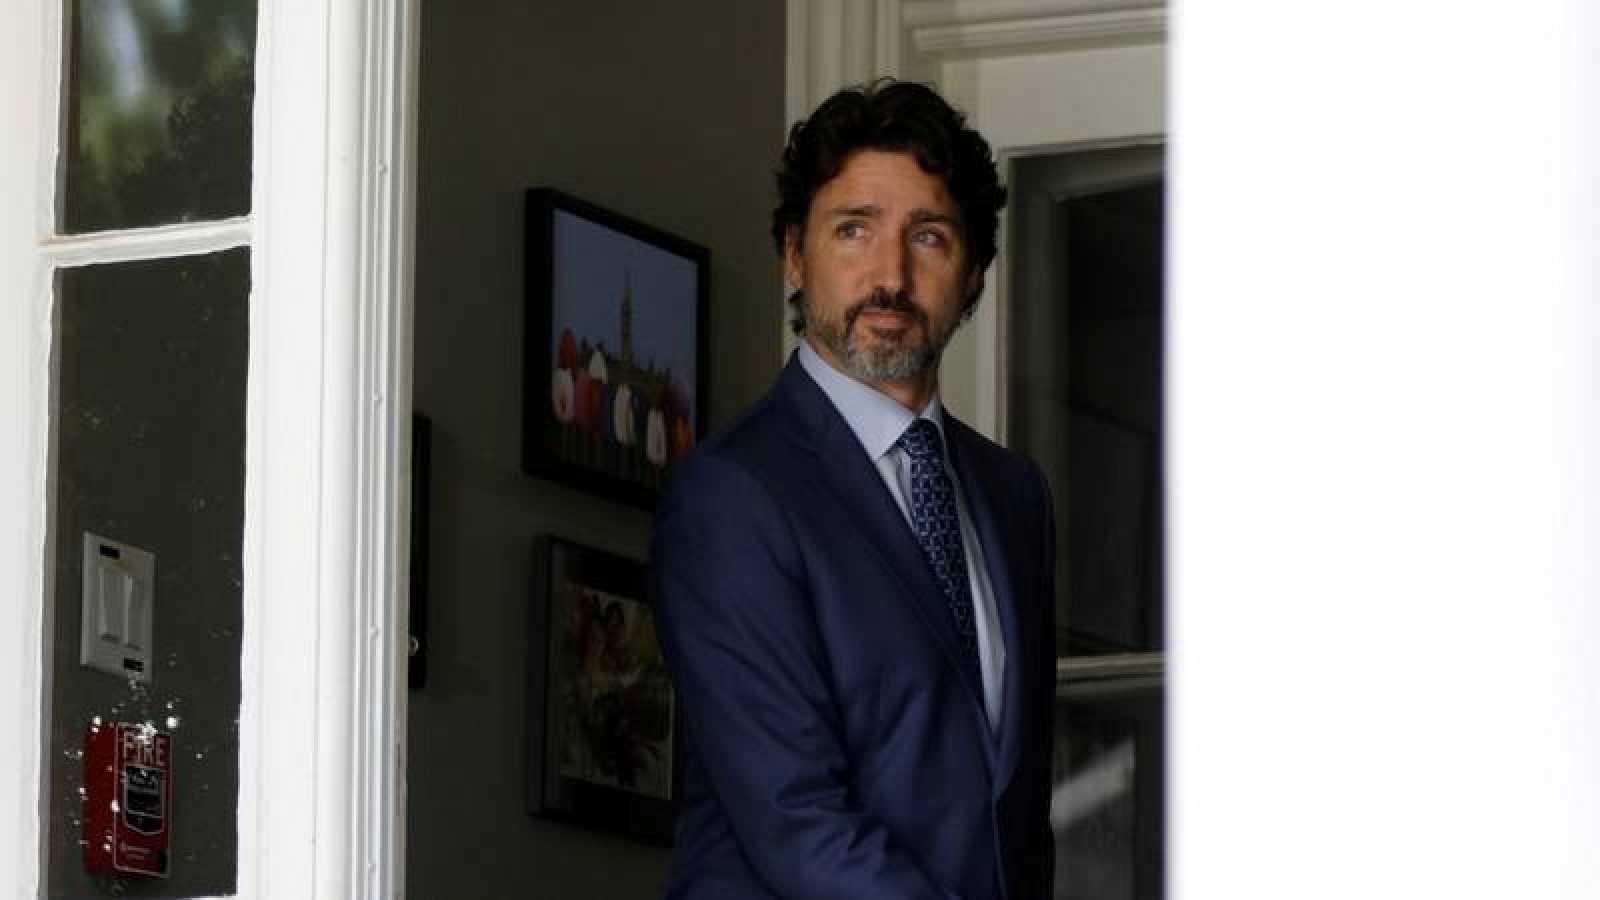 El primer ministro de Canadá, Justin Trudeau, en Ottawa